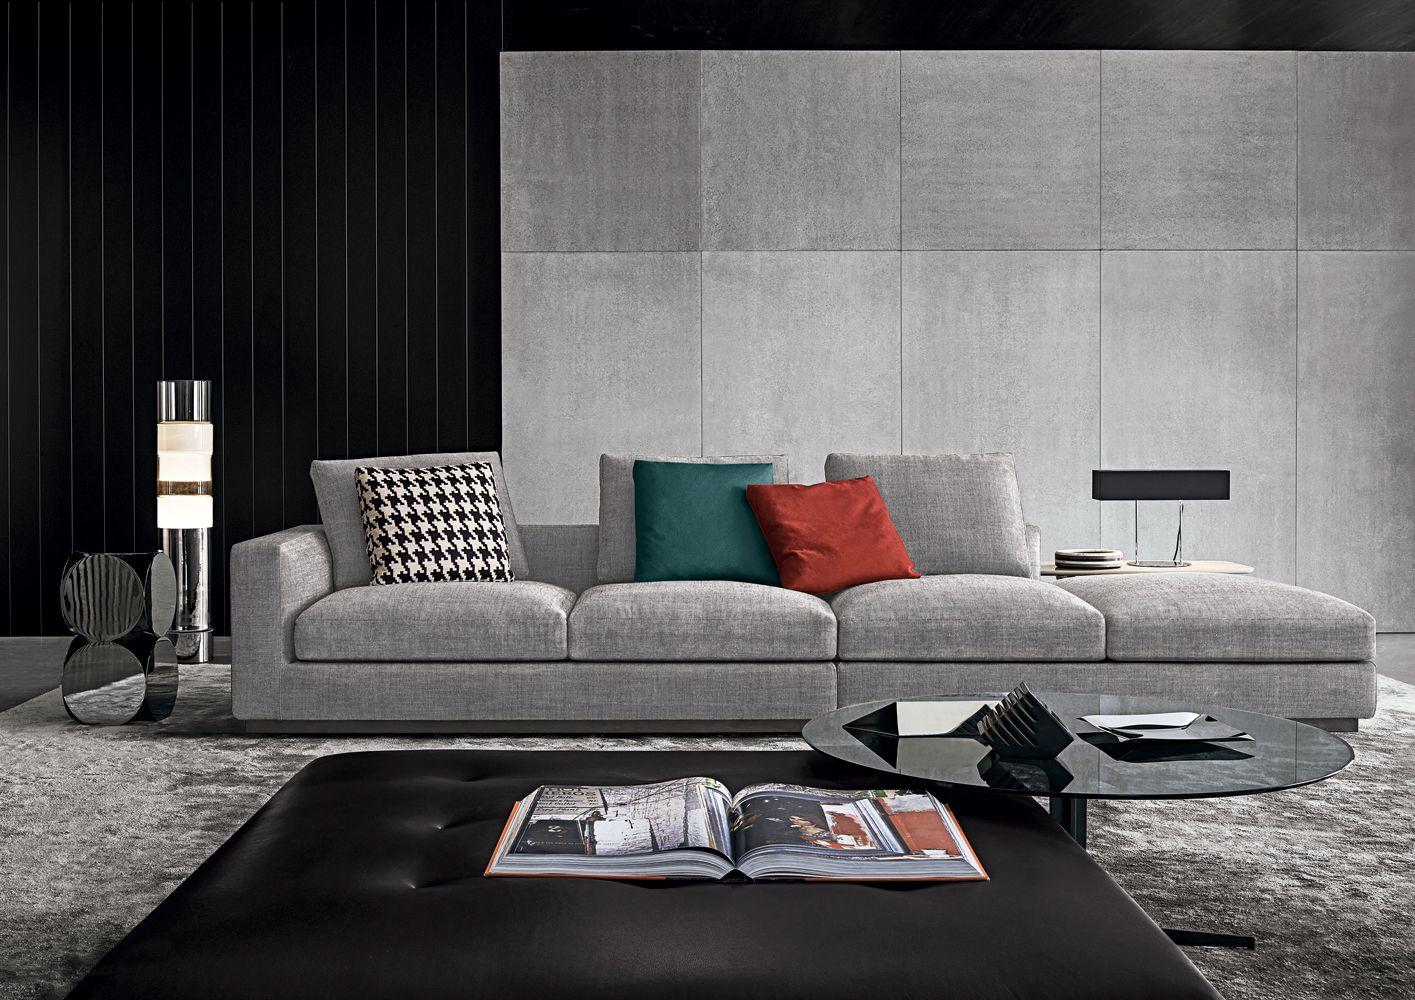 Minotti Ipad Andersen Line Andersen Line Quilt Divani It Minotti Cushions On Sofa Furniture